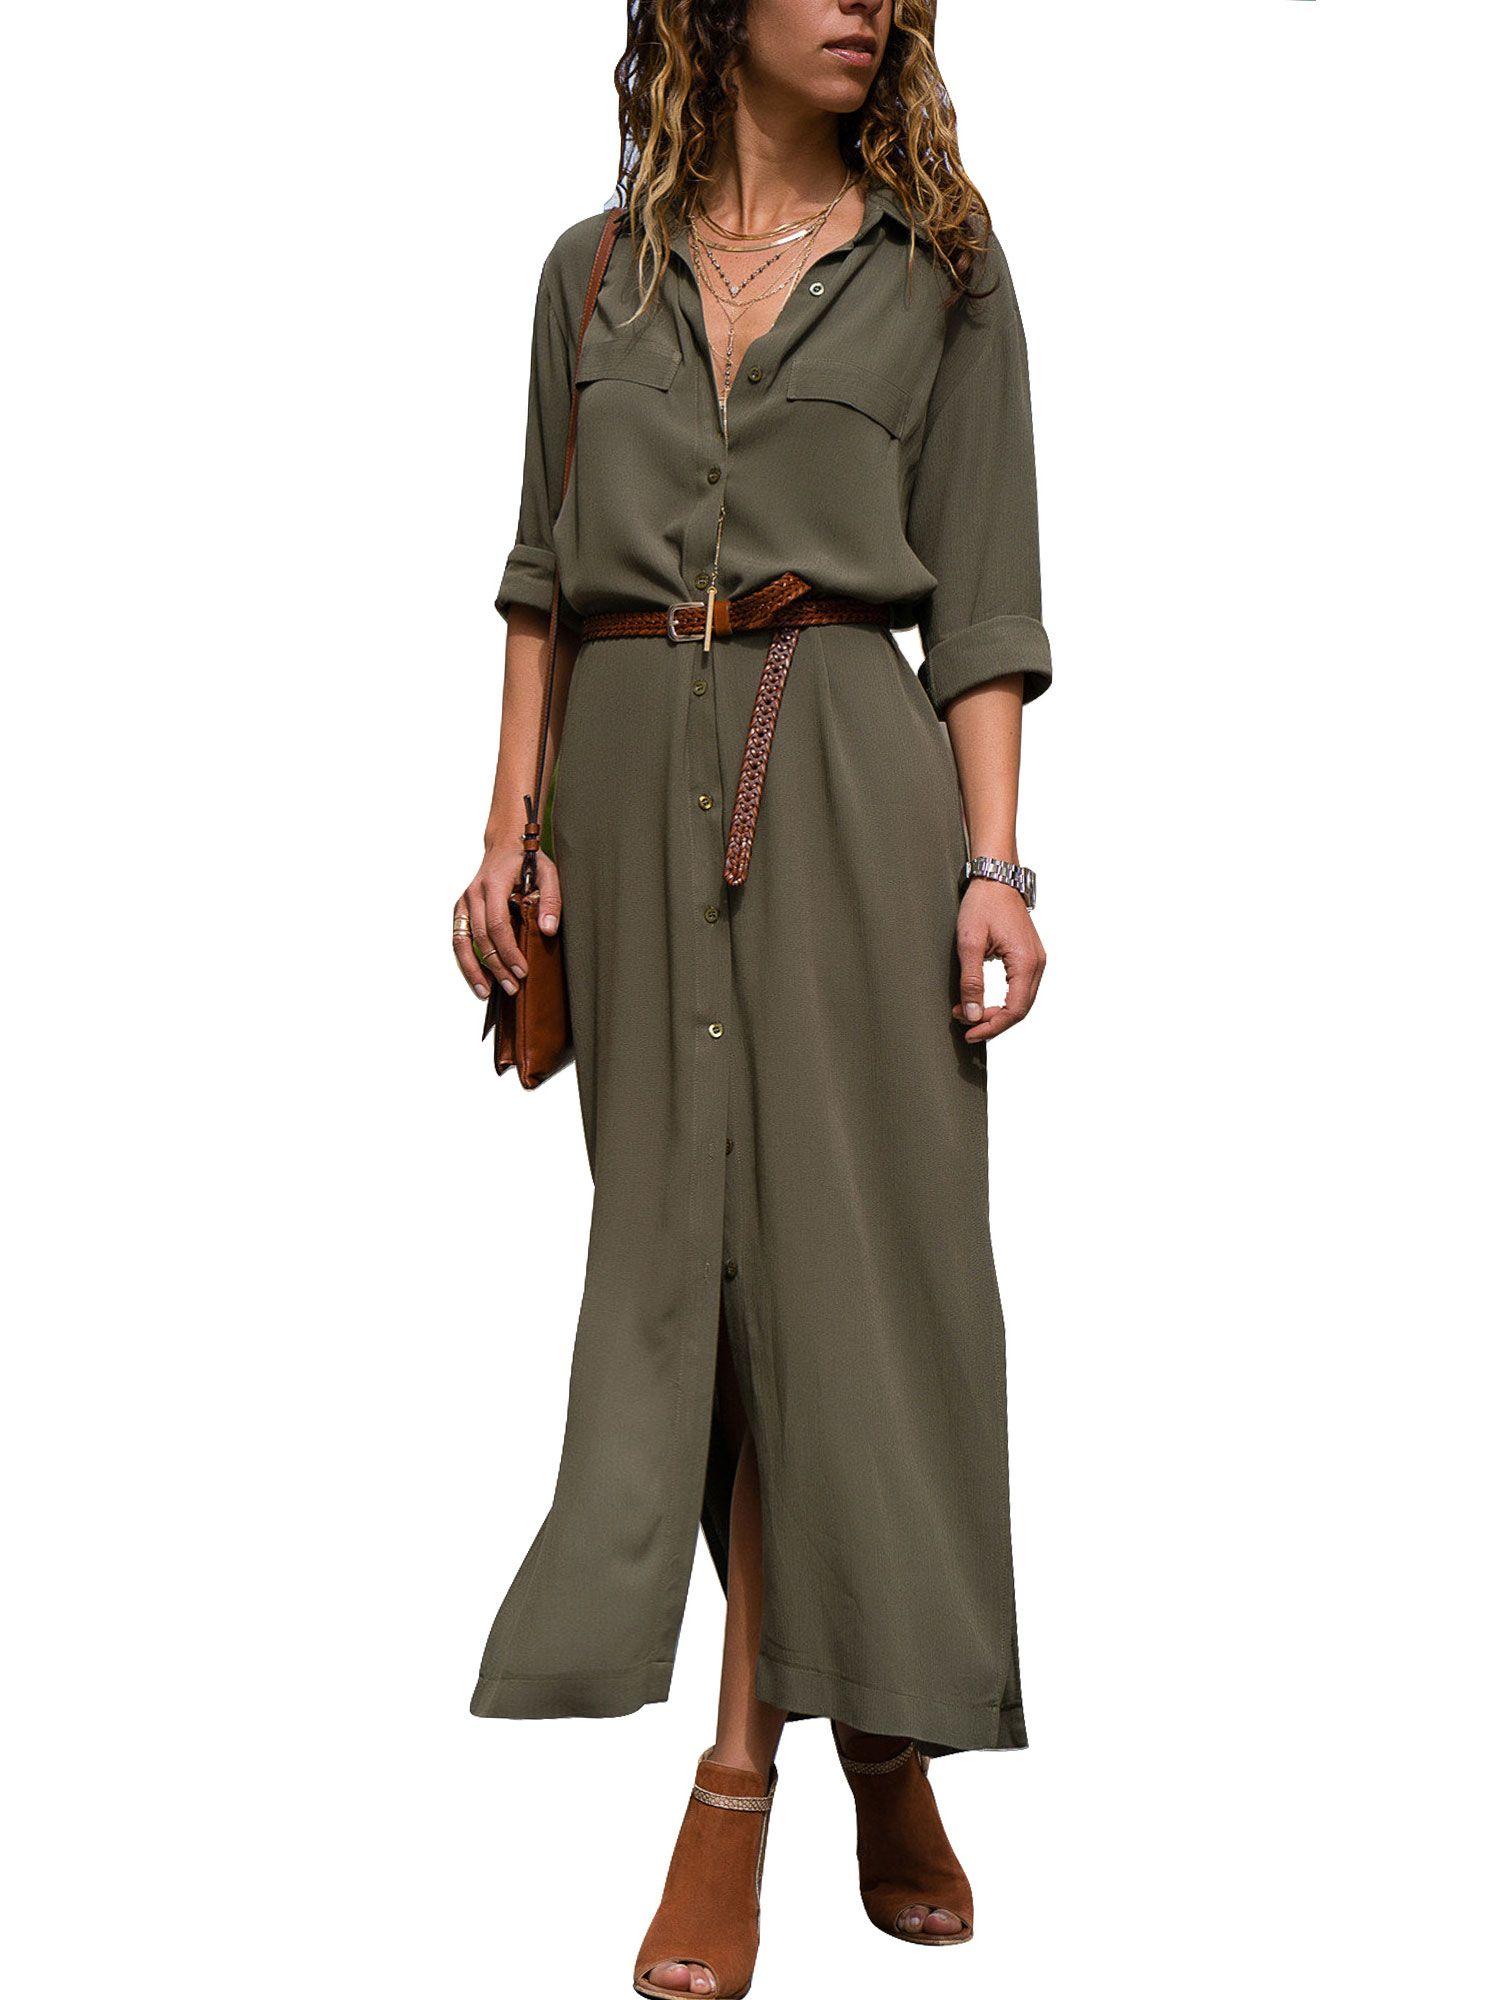 Himone Button Shirt Dresses For Women Maxi Long Sleeve Casual Loose Boho Tea Dress Lapel V Neck Side Split Sun Dress Walmart Com Maxi Shirt Dress Dress Shirt Sleeves Stylish [ 2000 x 1500 Pixel ]